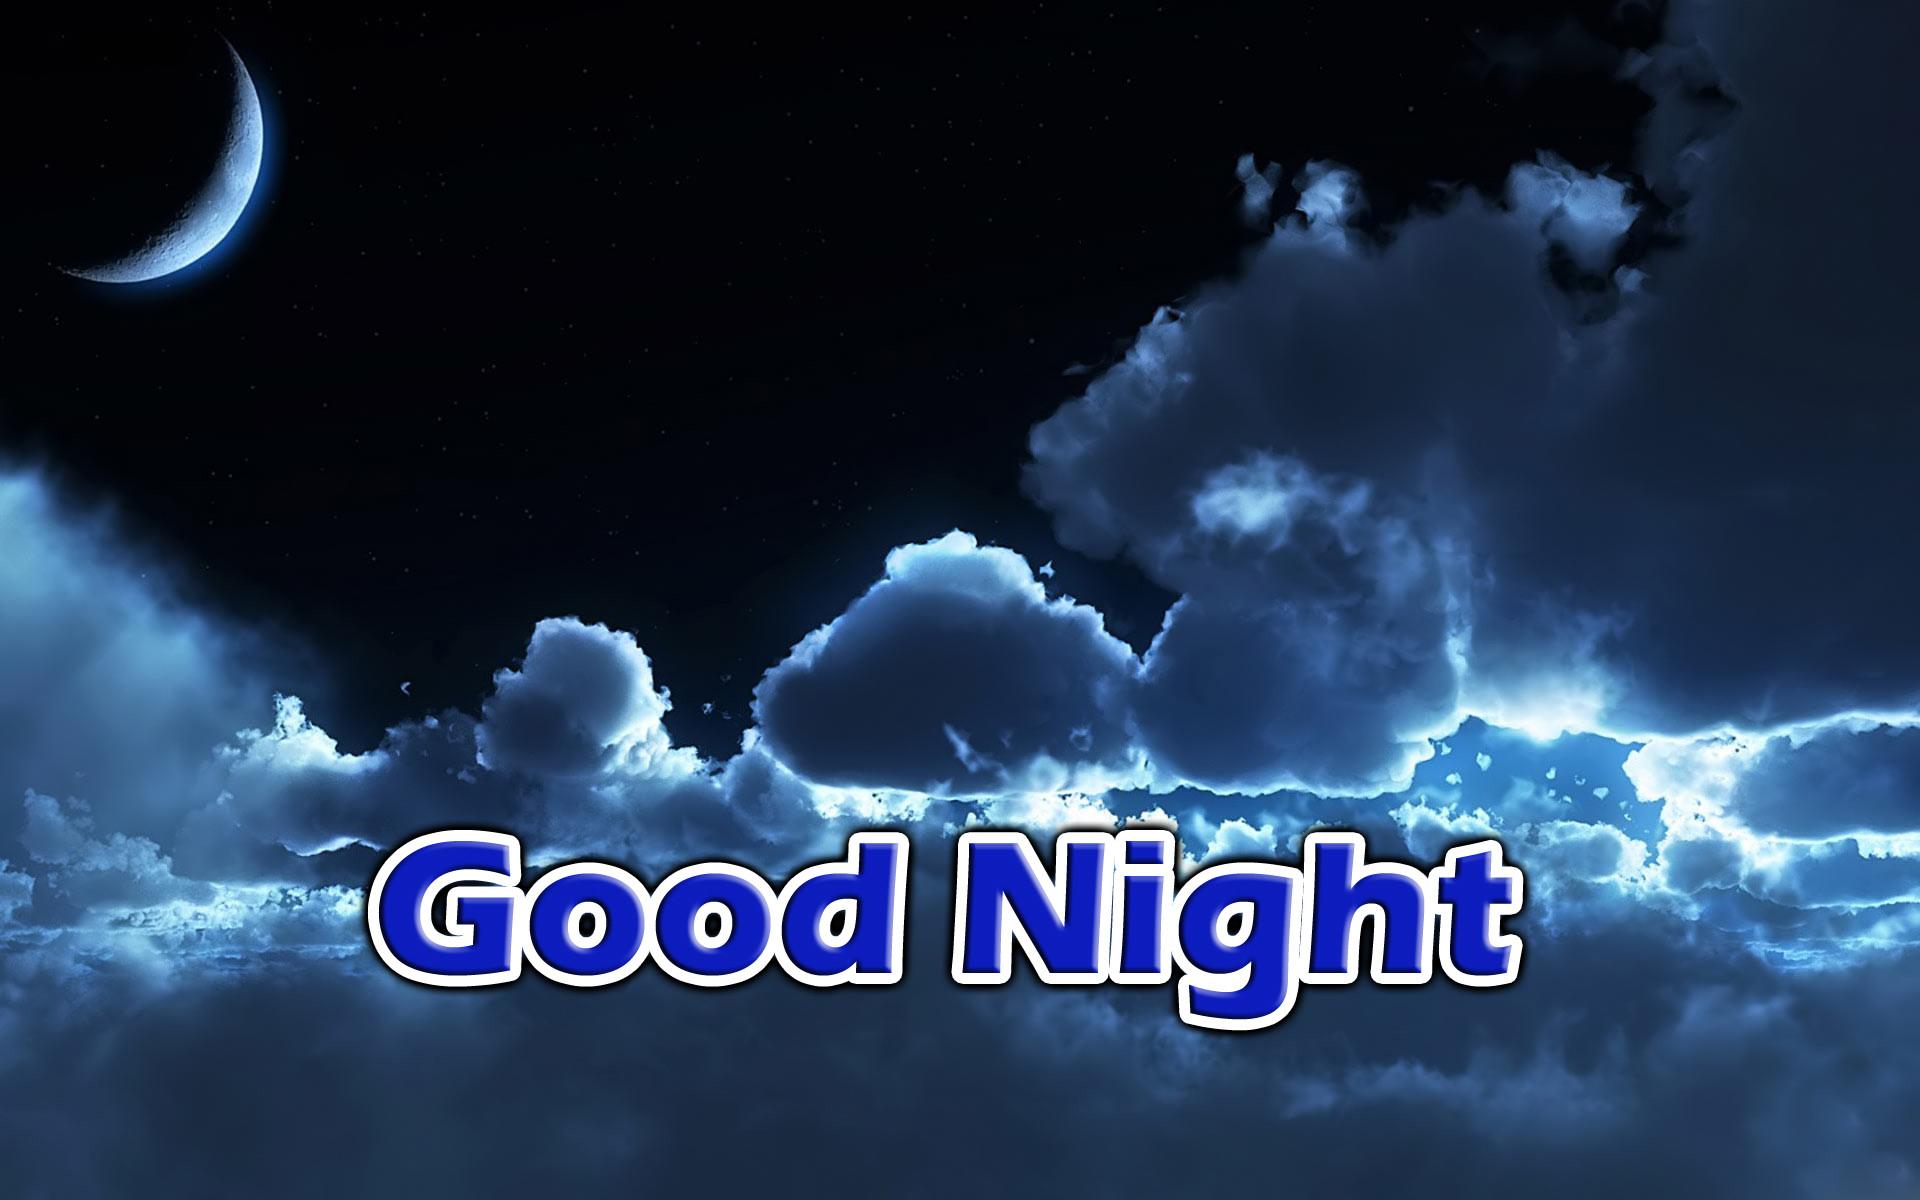 Www good night photo com